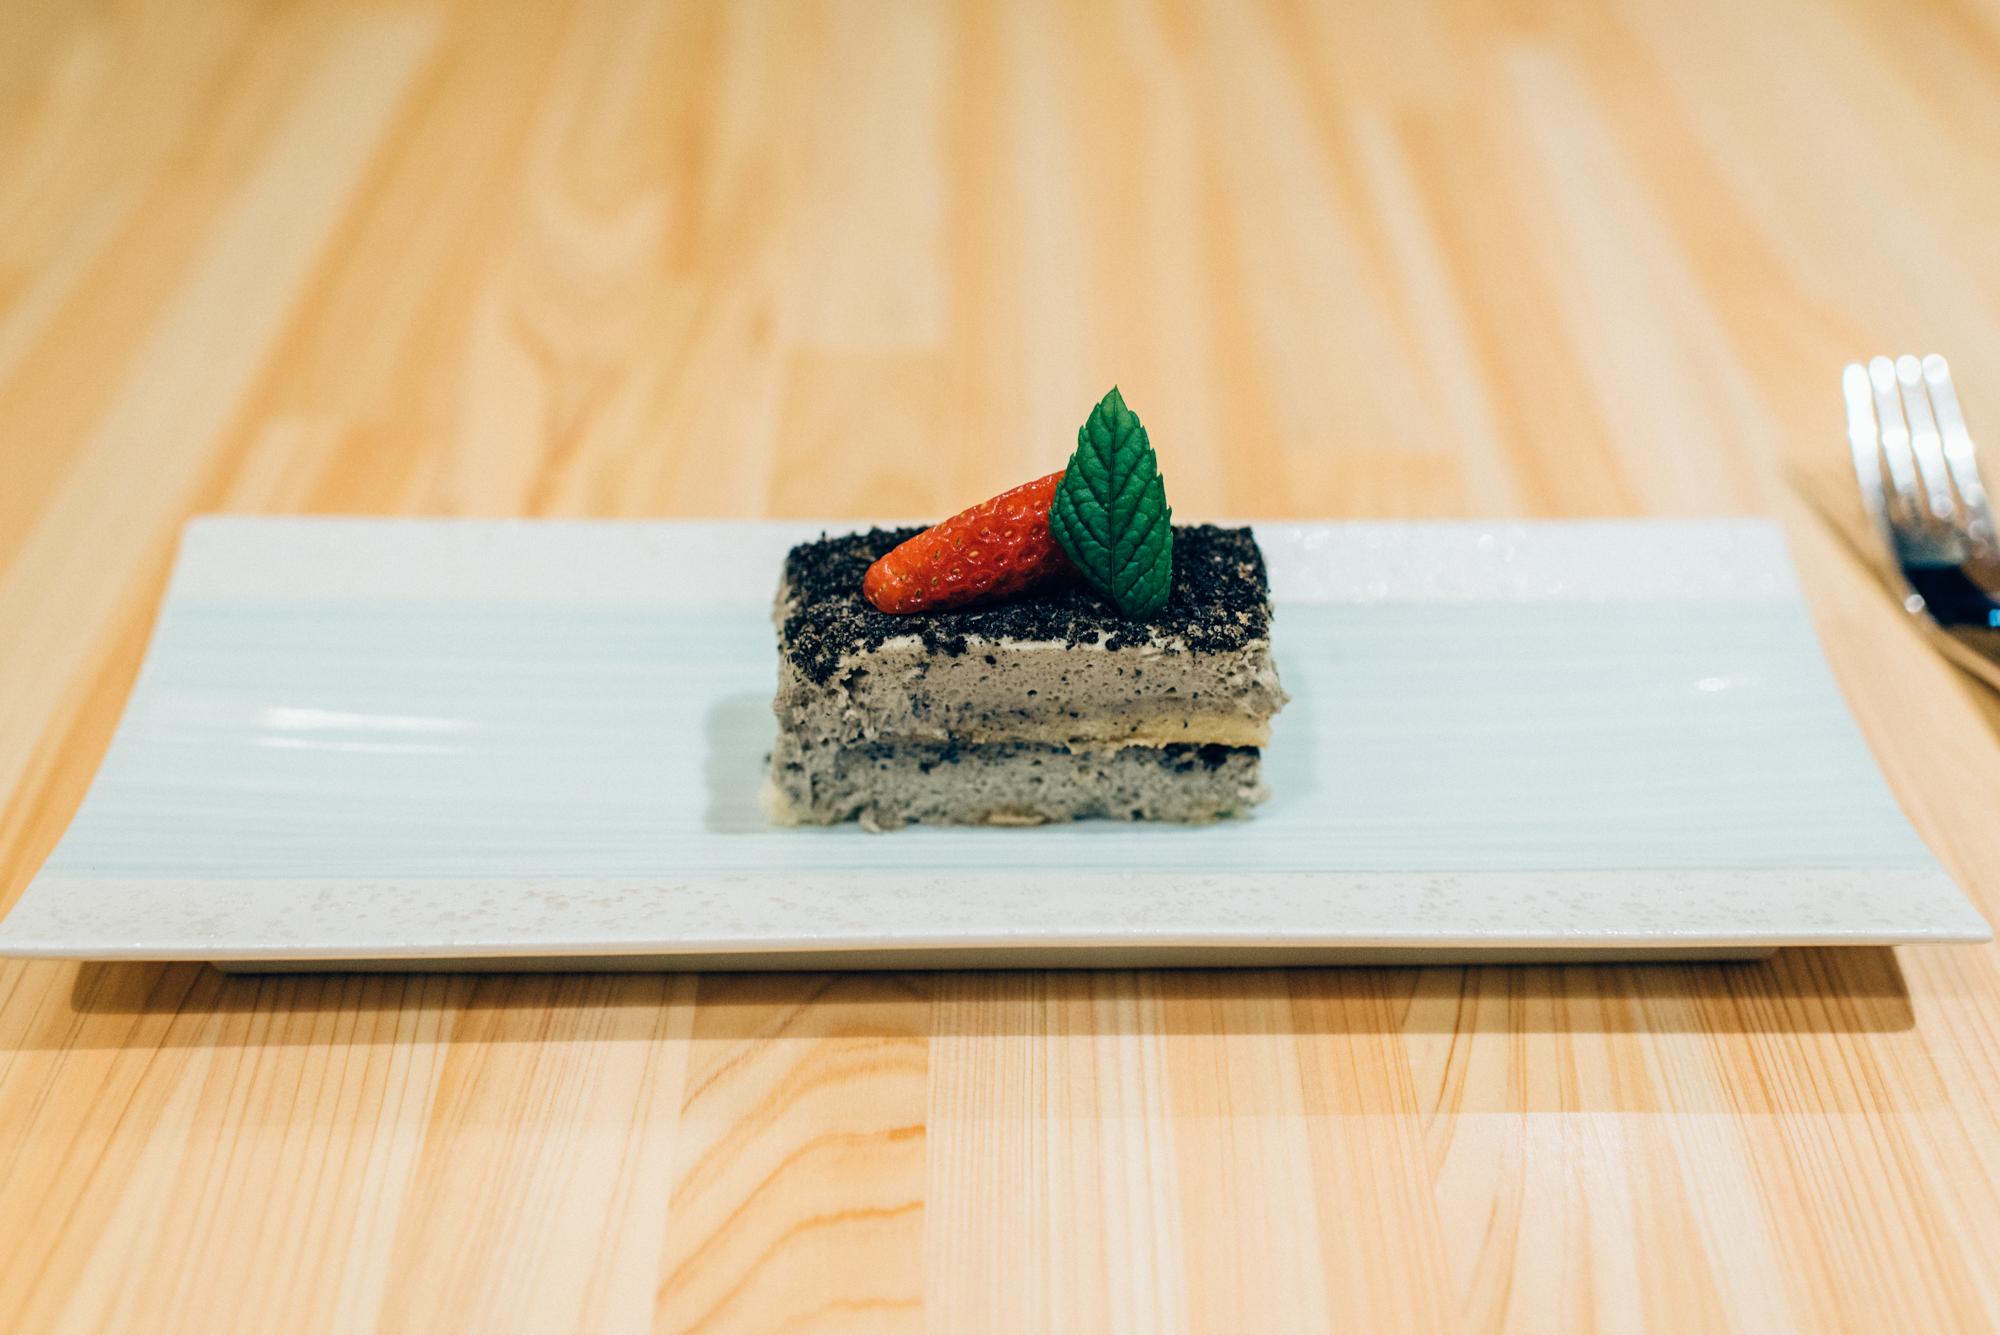 toronto-omakase-sushi-shoushin-23.jpg